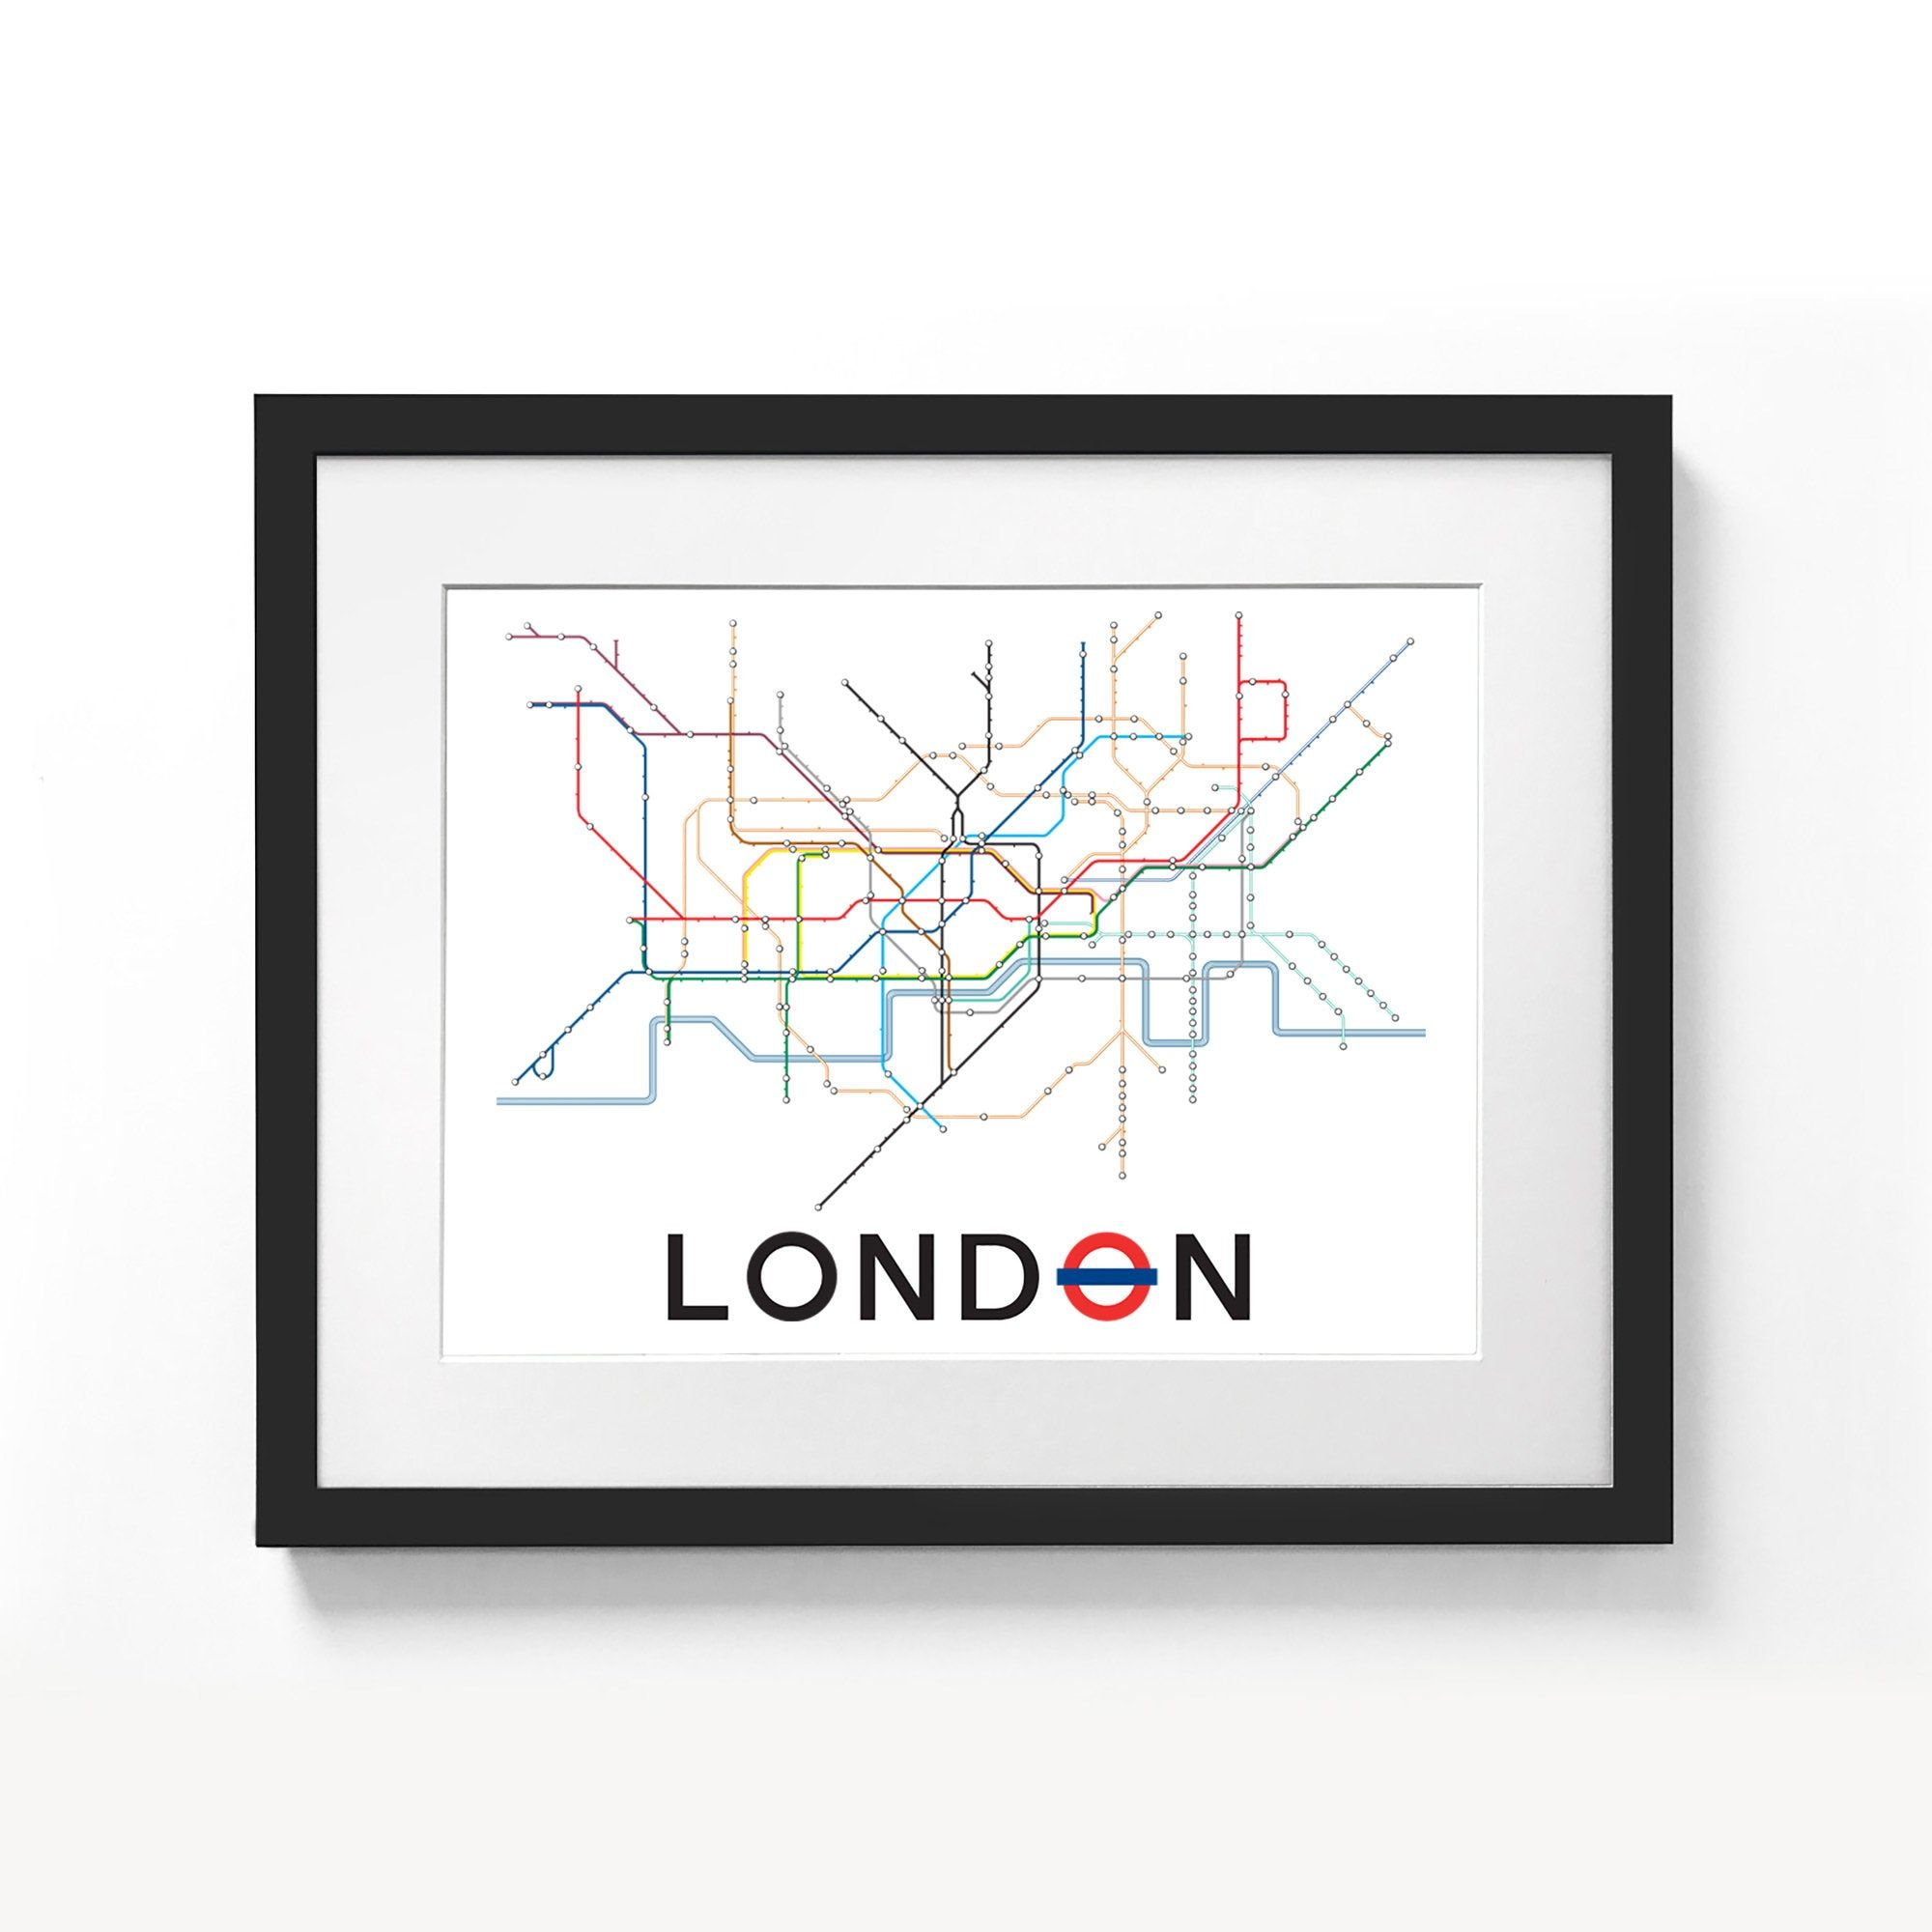 London Underground Tube Map Poster A3 A2 Sizes Minimalist